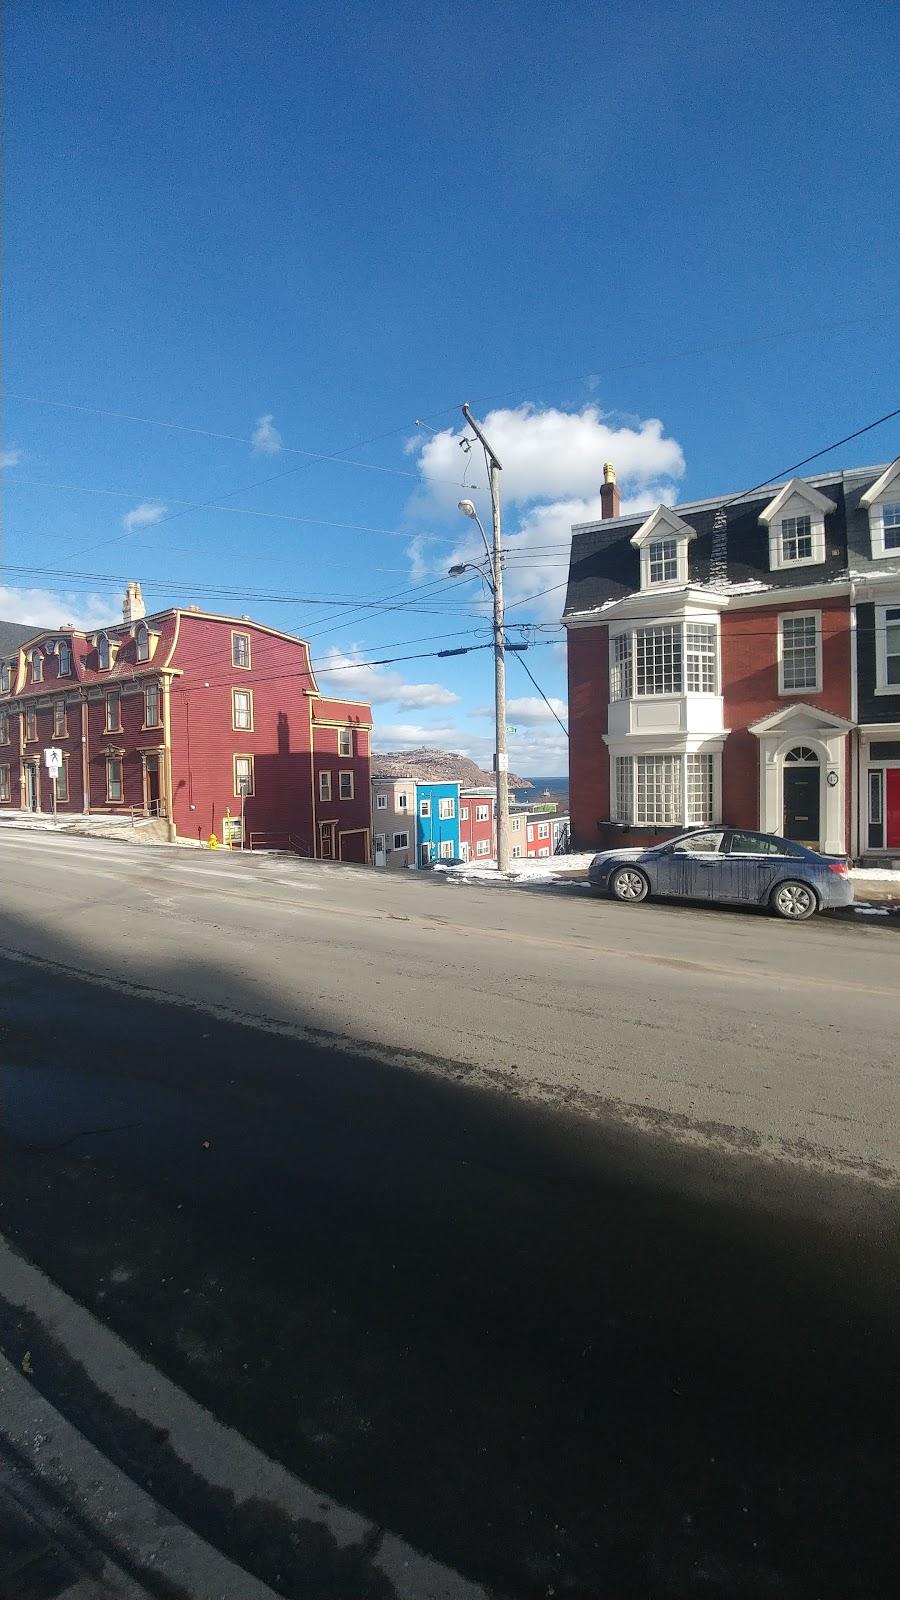 Balmoral Inn - Downtown St. Johns   lodging   38 Queens Rd, St. Johns, NL A1C 2A5, Canada   7097545721 OR +1 709-754-5721